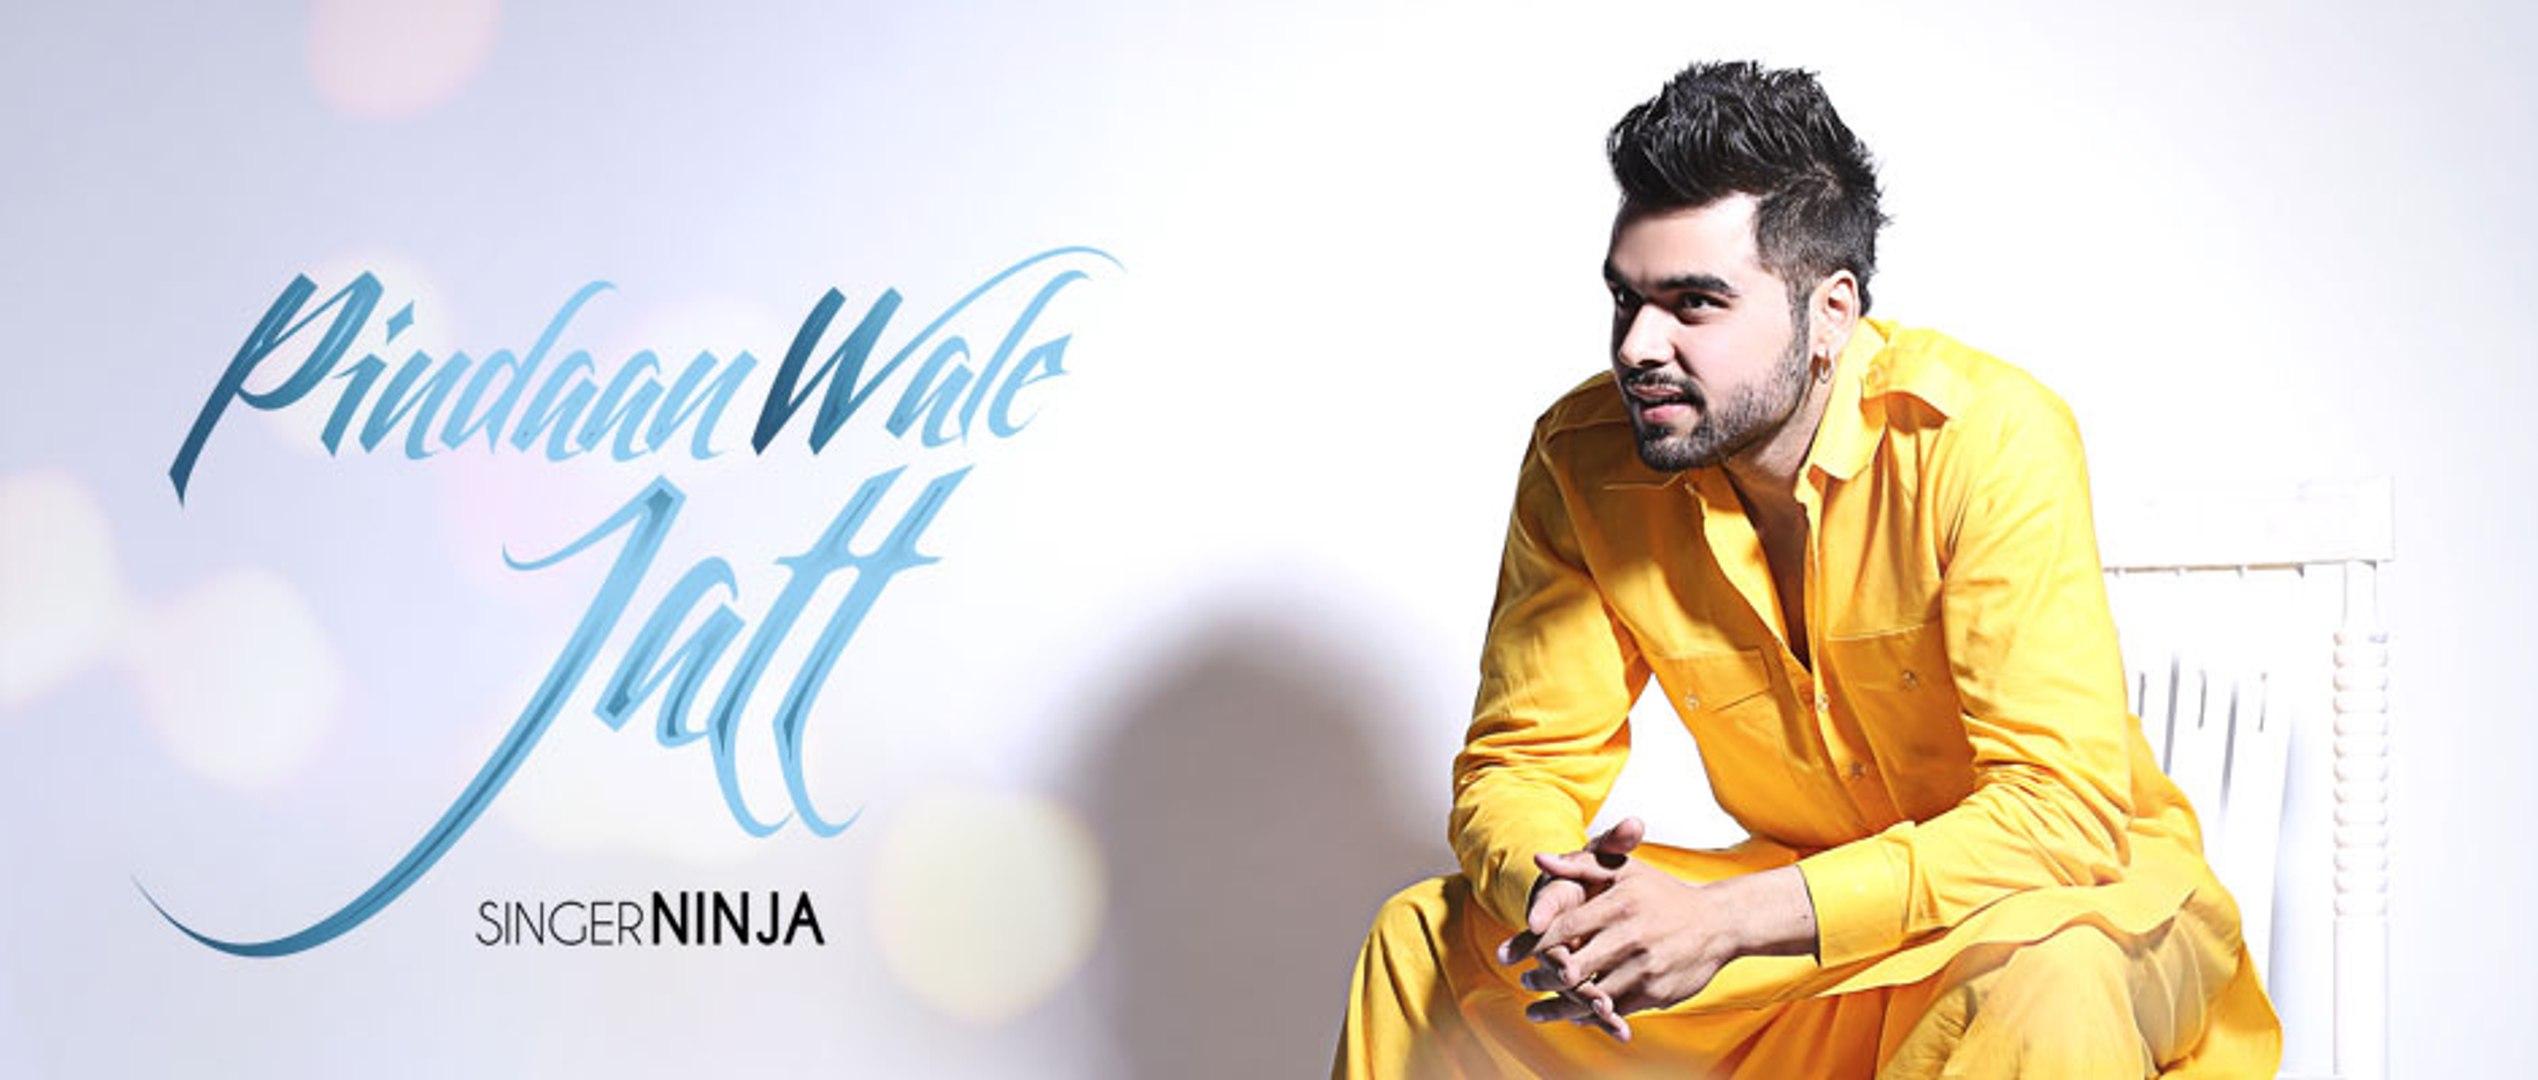 Pinda Wale Jatt New Song Mp3 Download